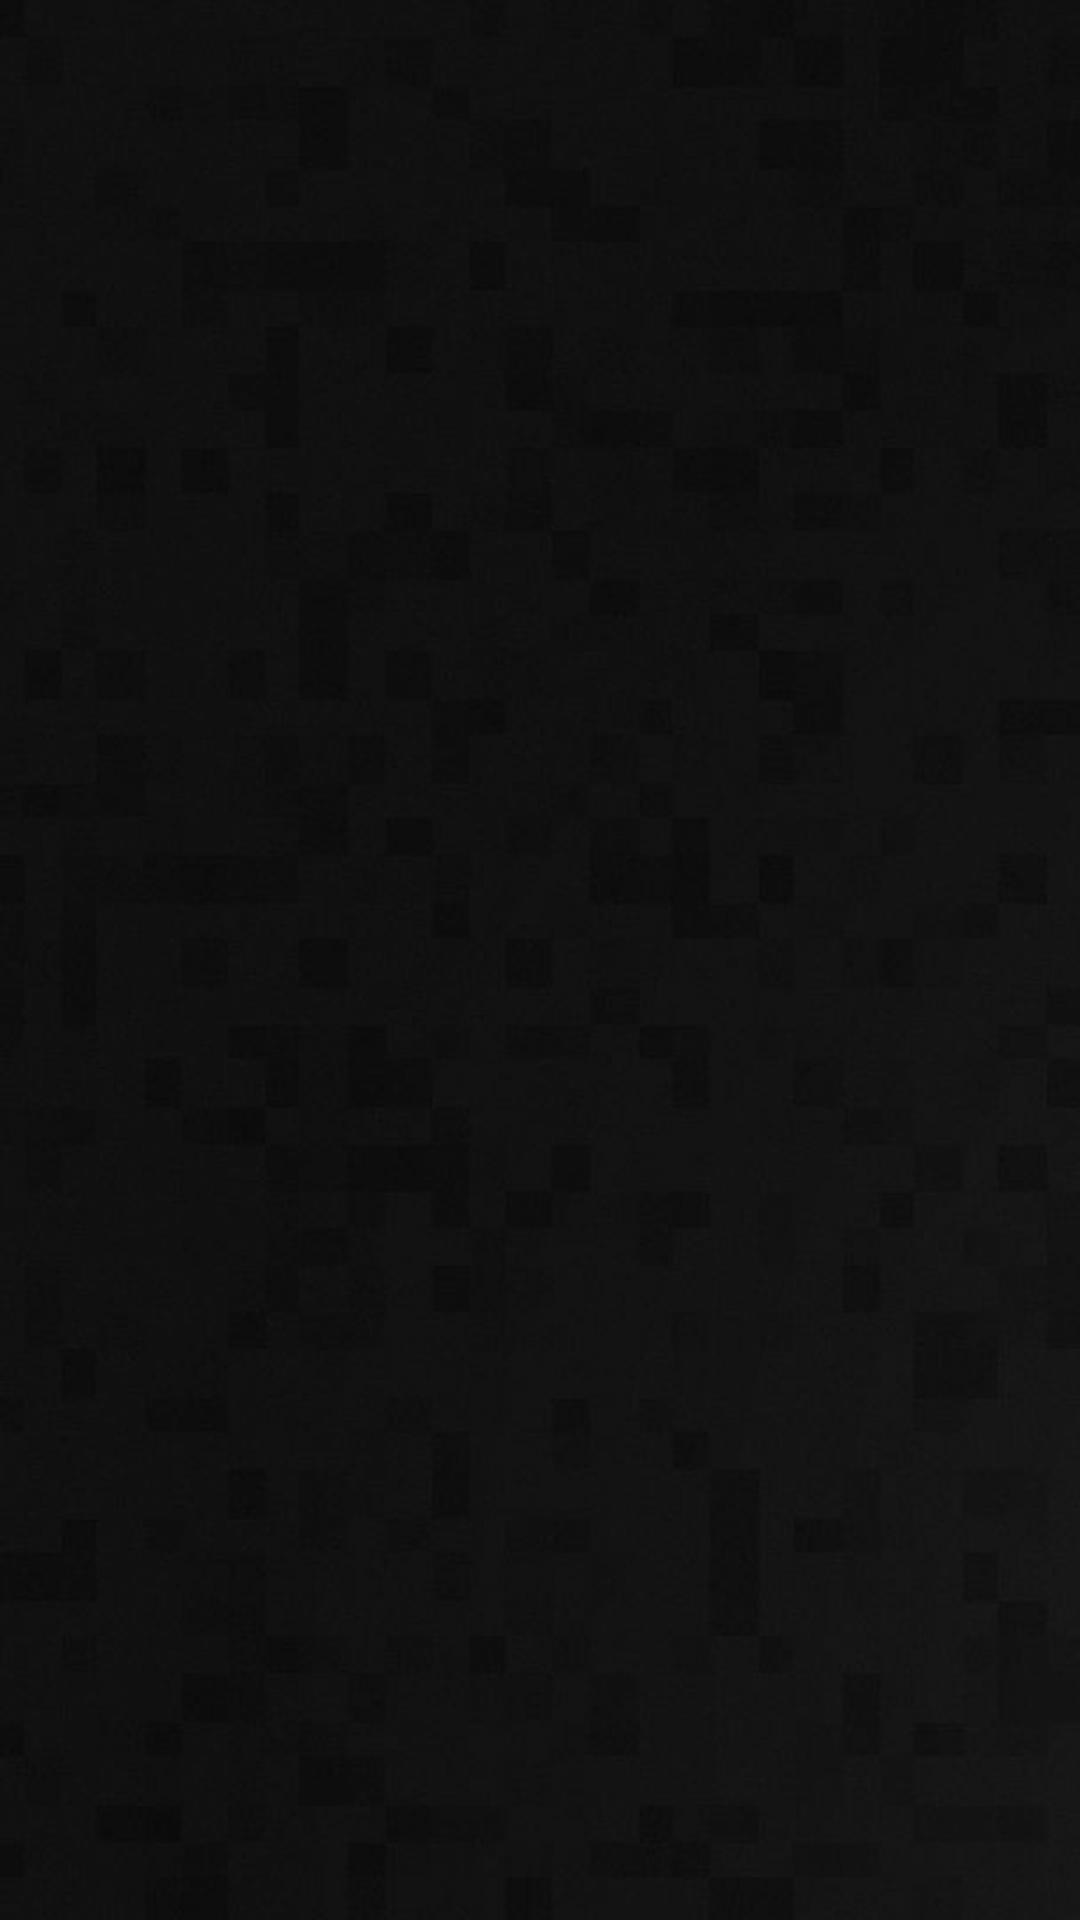 Black Wallpapers 1080X1920 Black Iphone 6 Plus Wallpaper 1080x1920